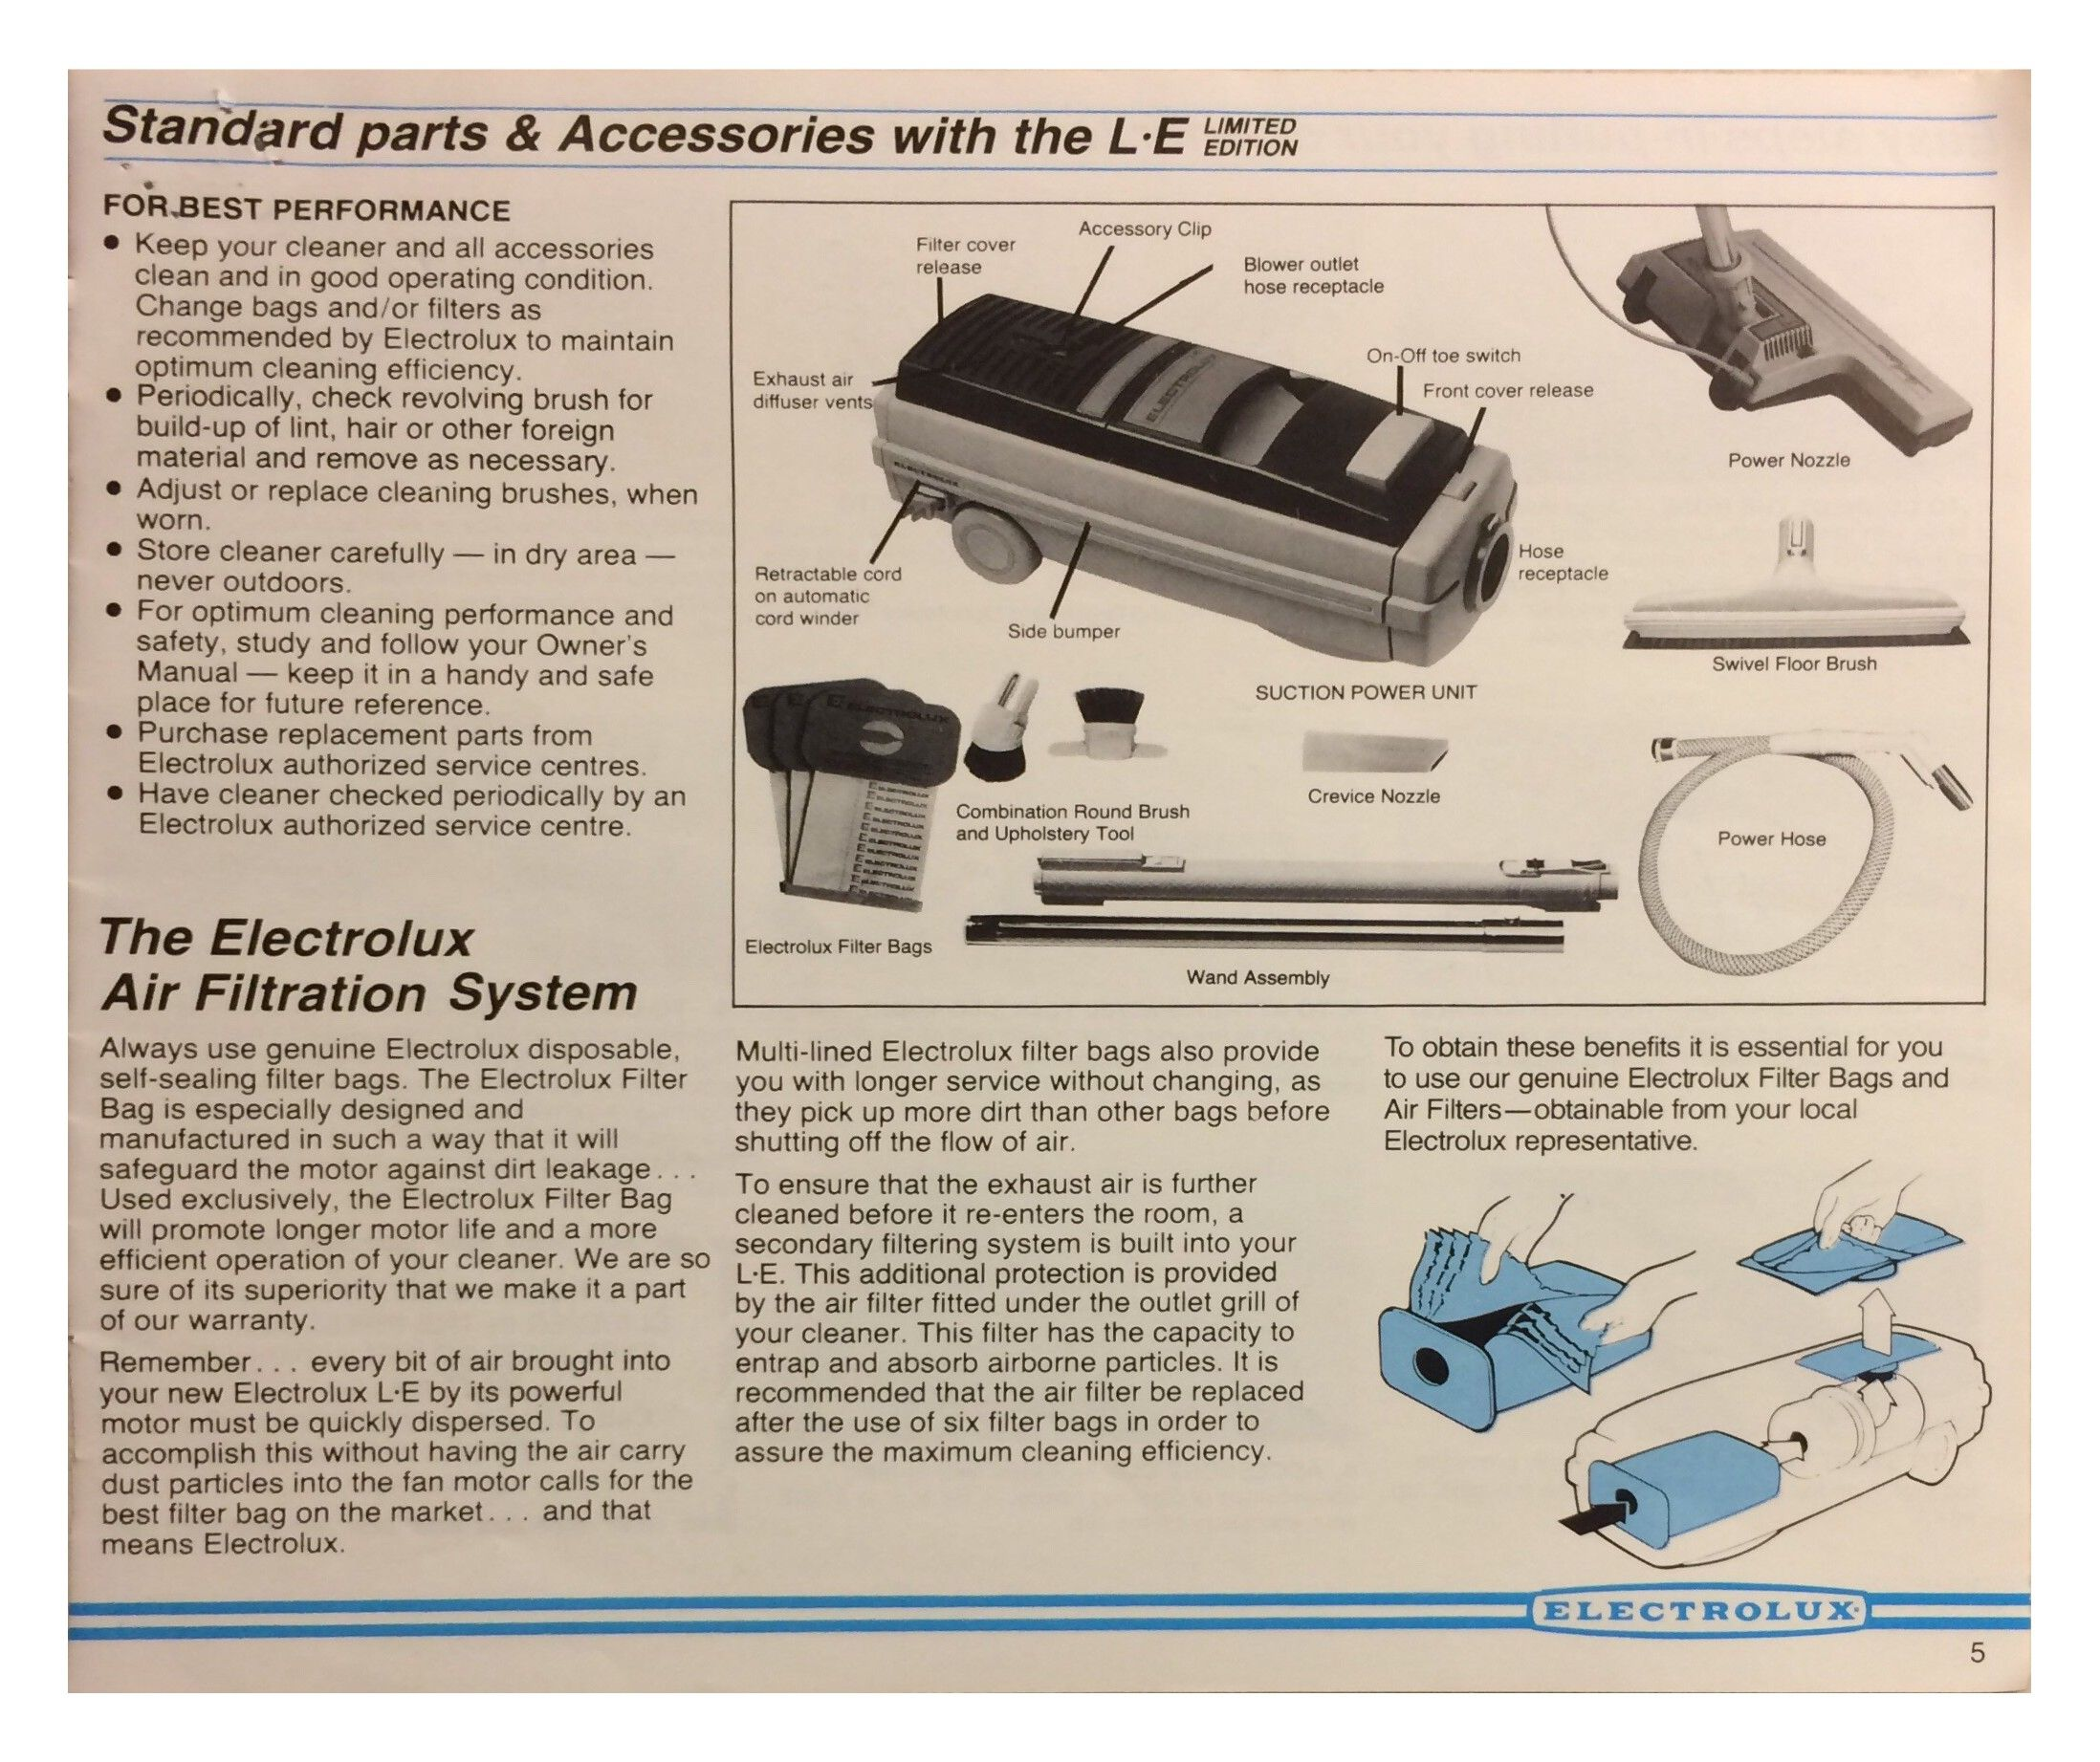 le electrolux limited edition vacuum cleaner manual pg 5 rh pinterest com Electrolux Carpet Shampooer Parts Electrolux Shampooer Manual